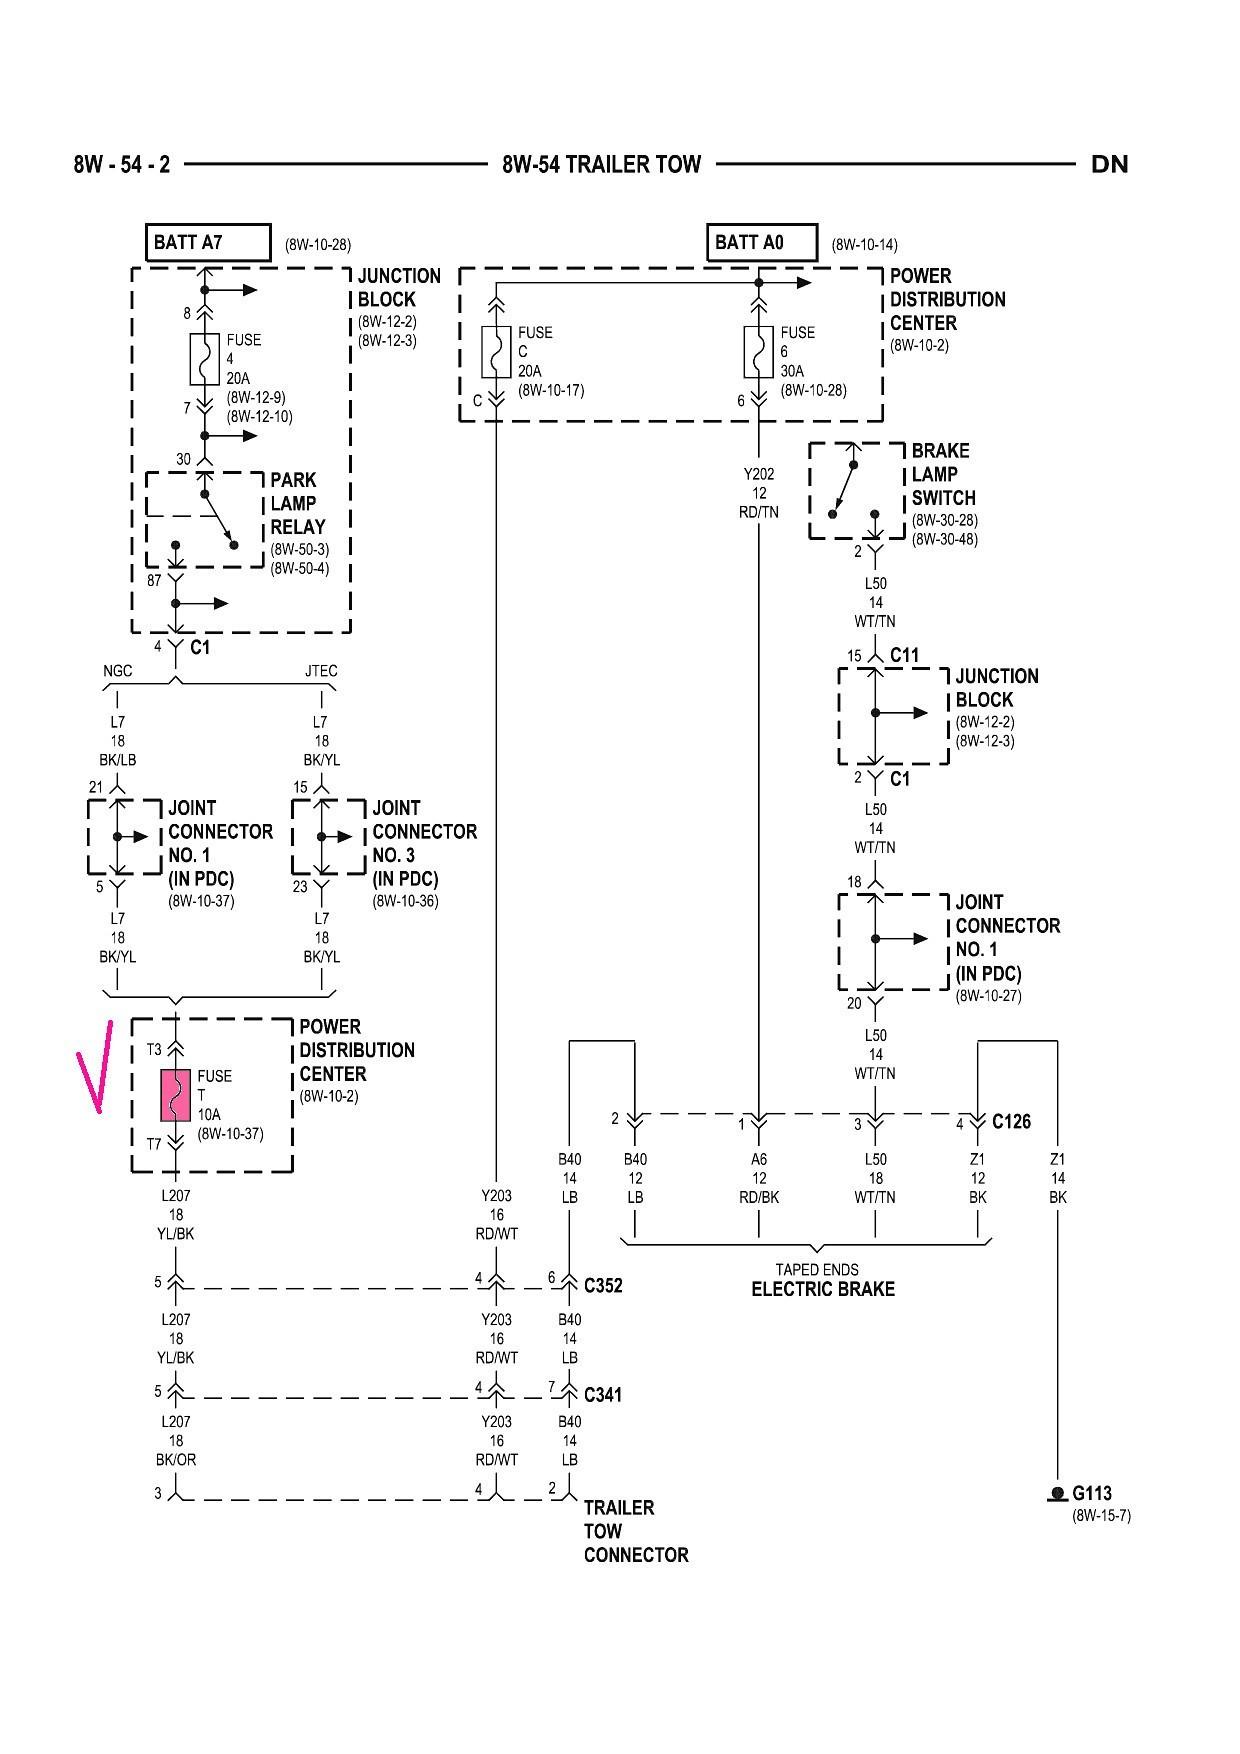 2003 dodge ram 2500 trailer wiring diagram 2008 dodge ram 1500 trailer brake wiring diagram inspirationa 2003 dodge trailer wiring harness diagram wiring 7b